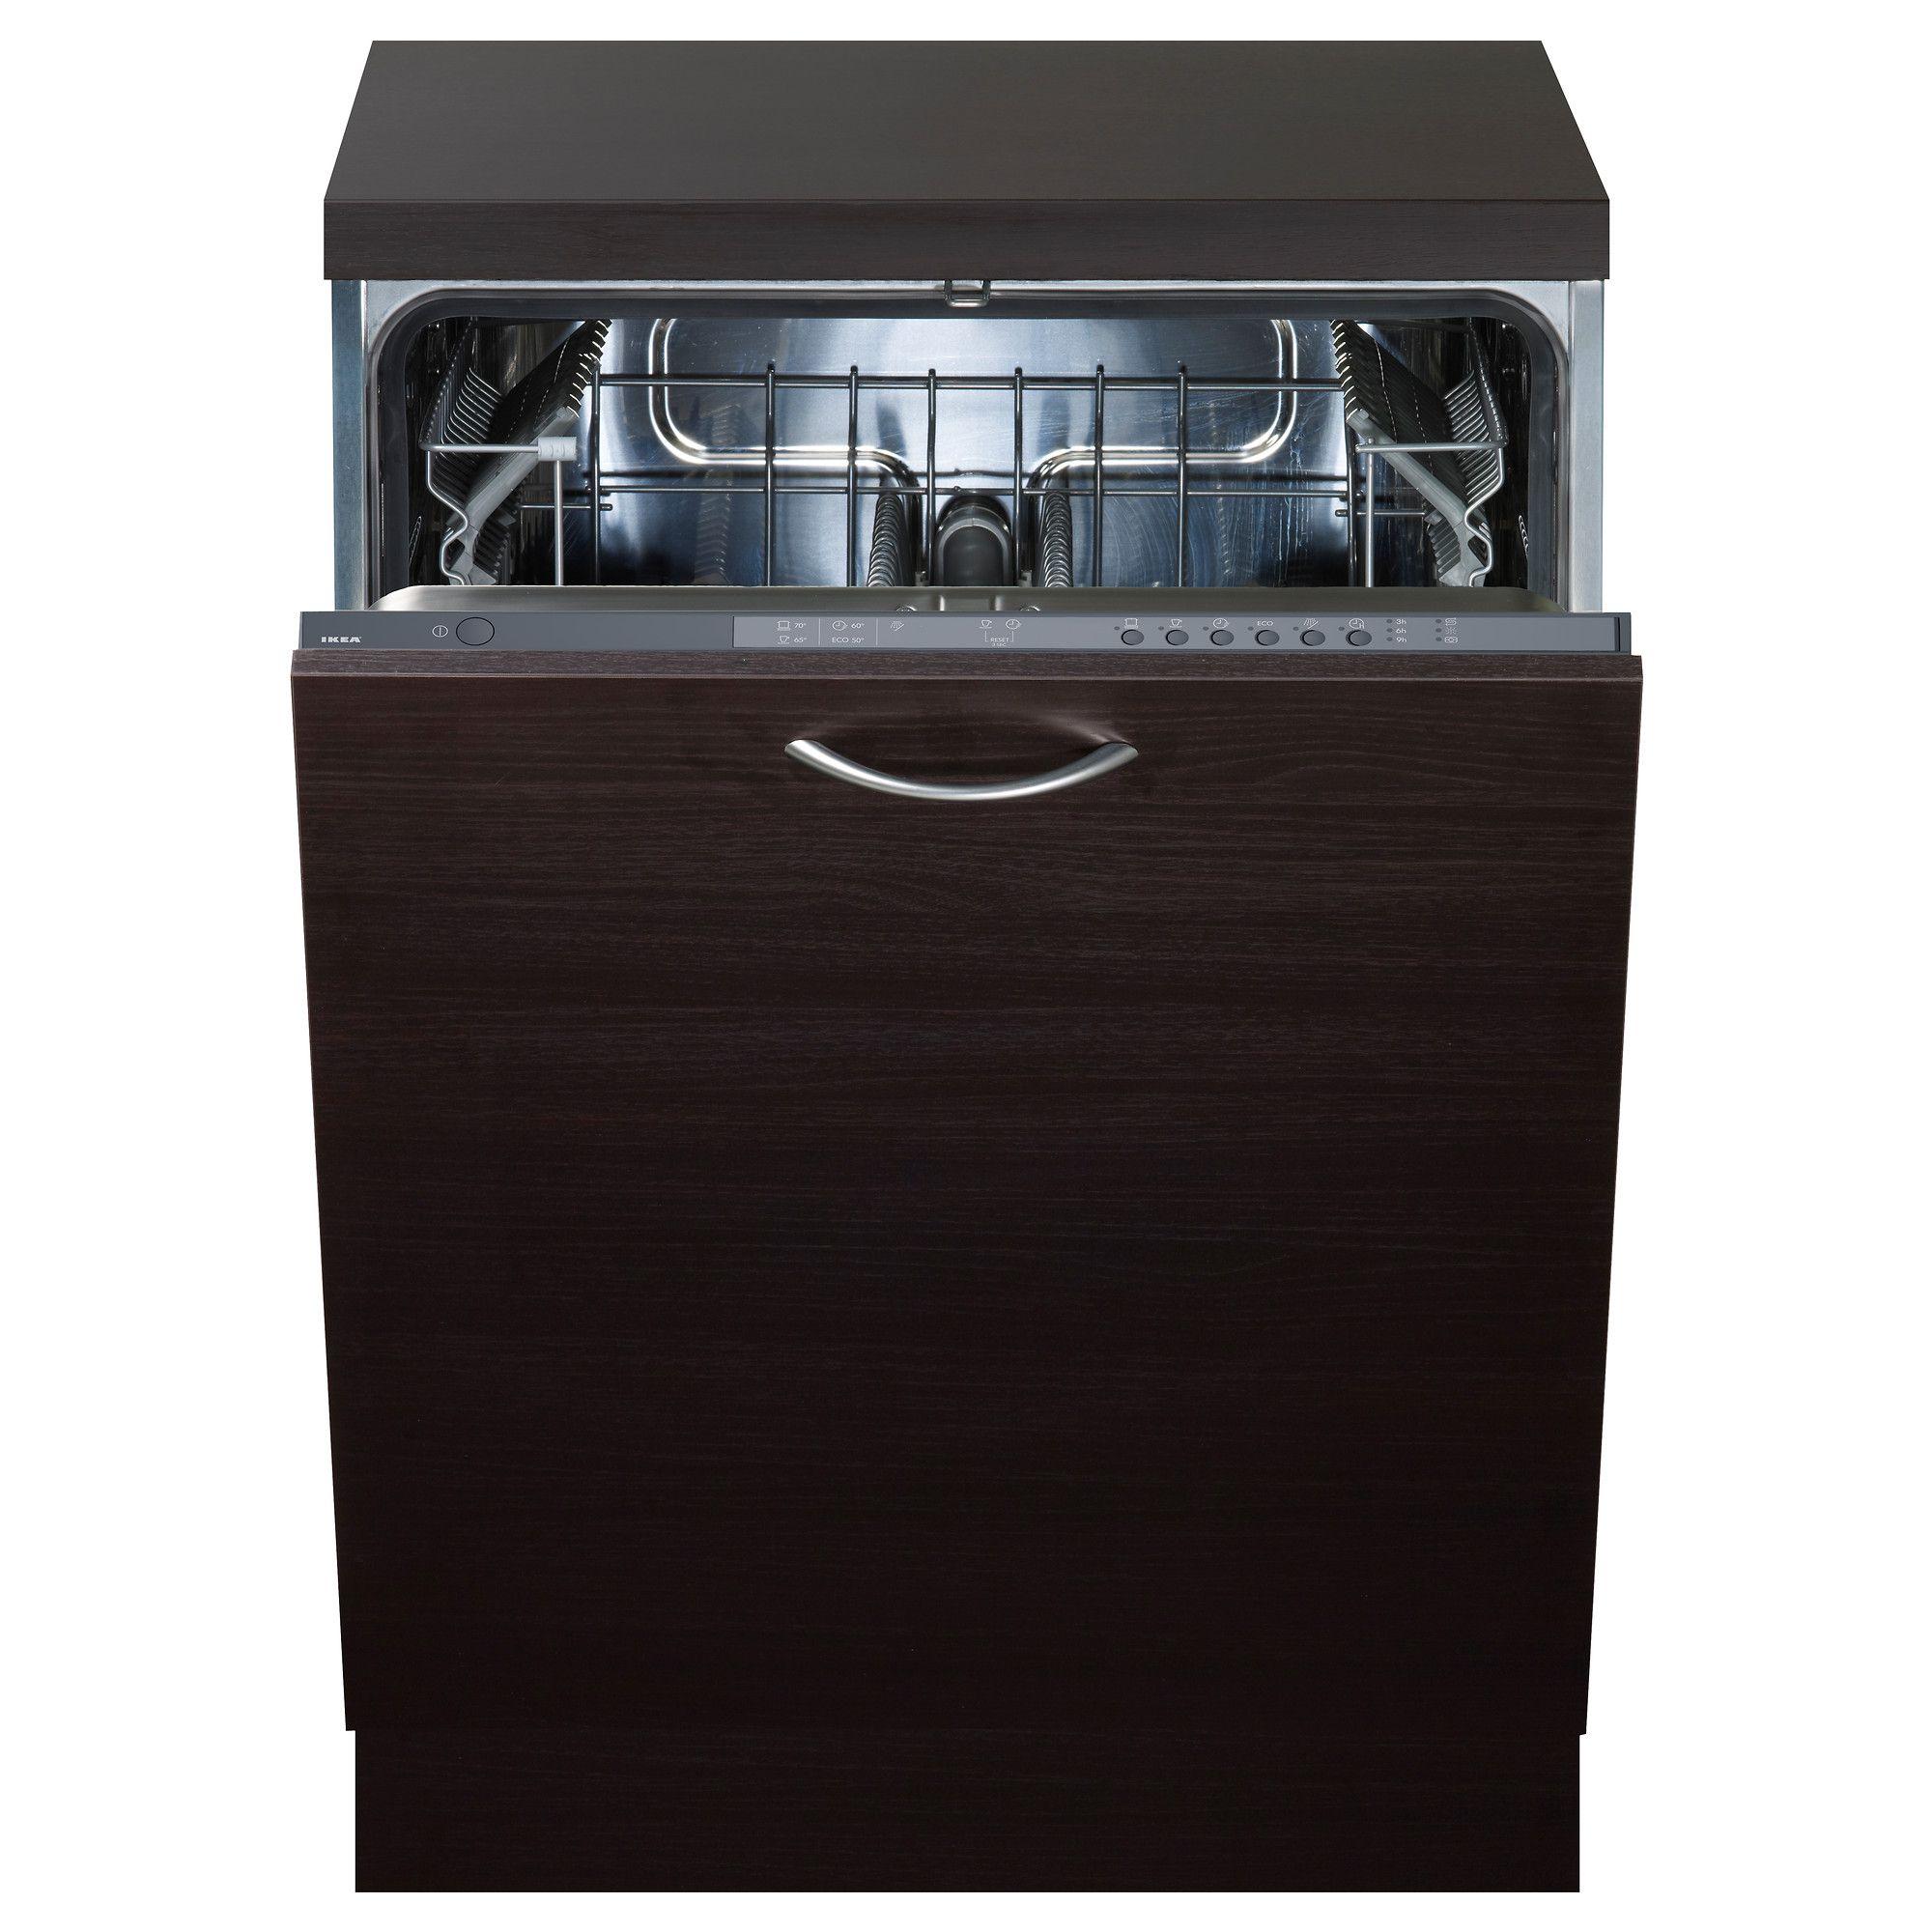 reng ra lave vaisselle encastrable ikea 399 p15b u2022 0113 rh pinterest com ikea rengora dishwasher installation instructions ikea rengora dishwasher manual